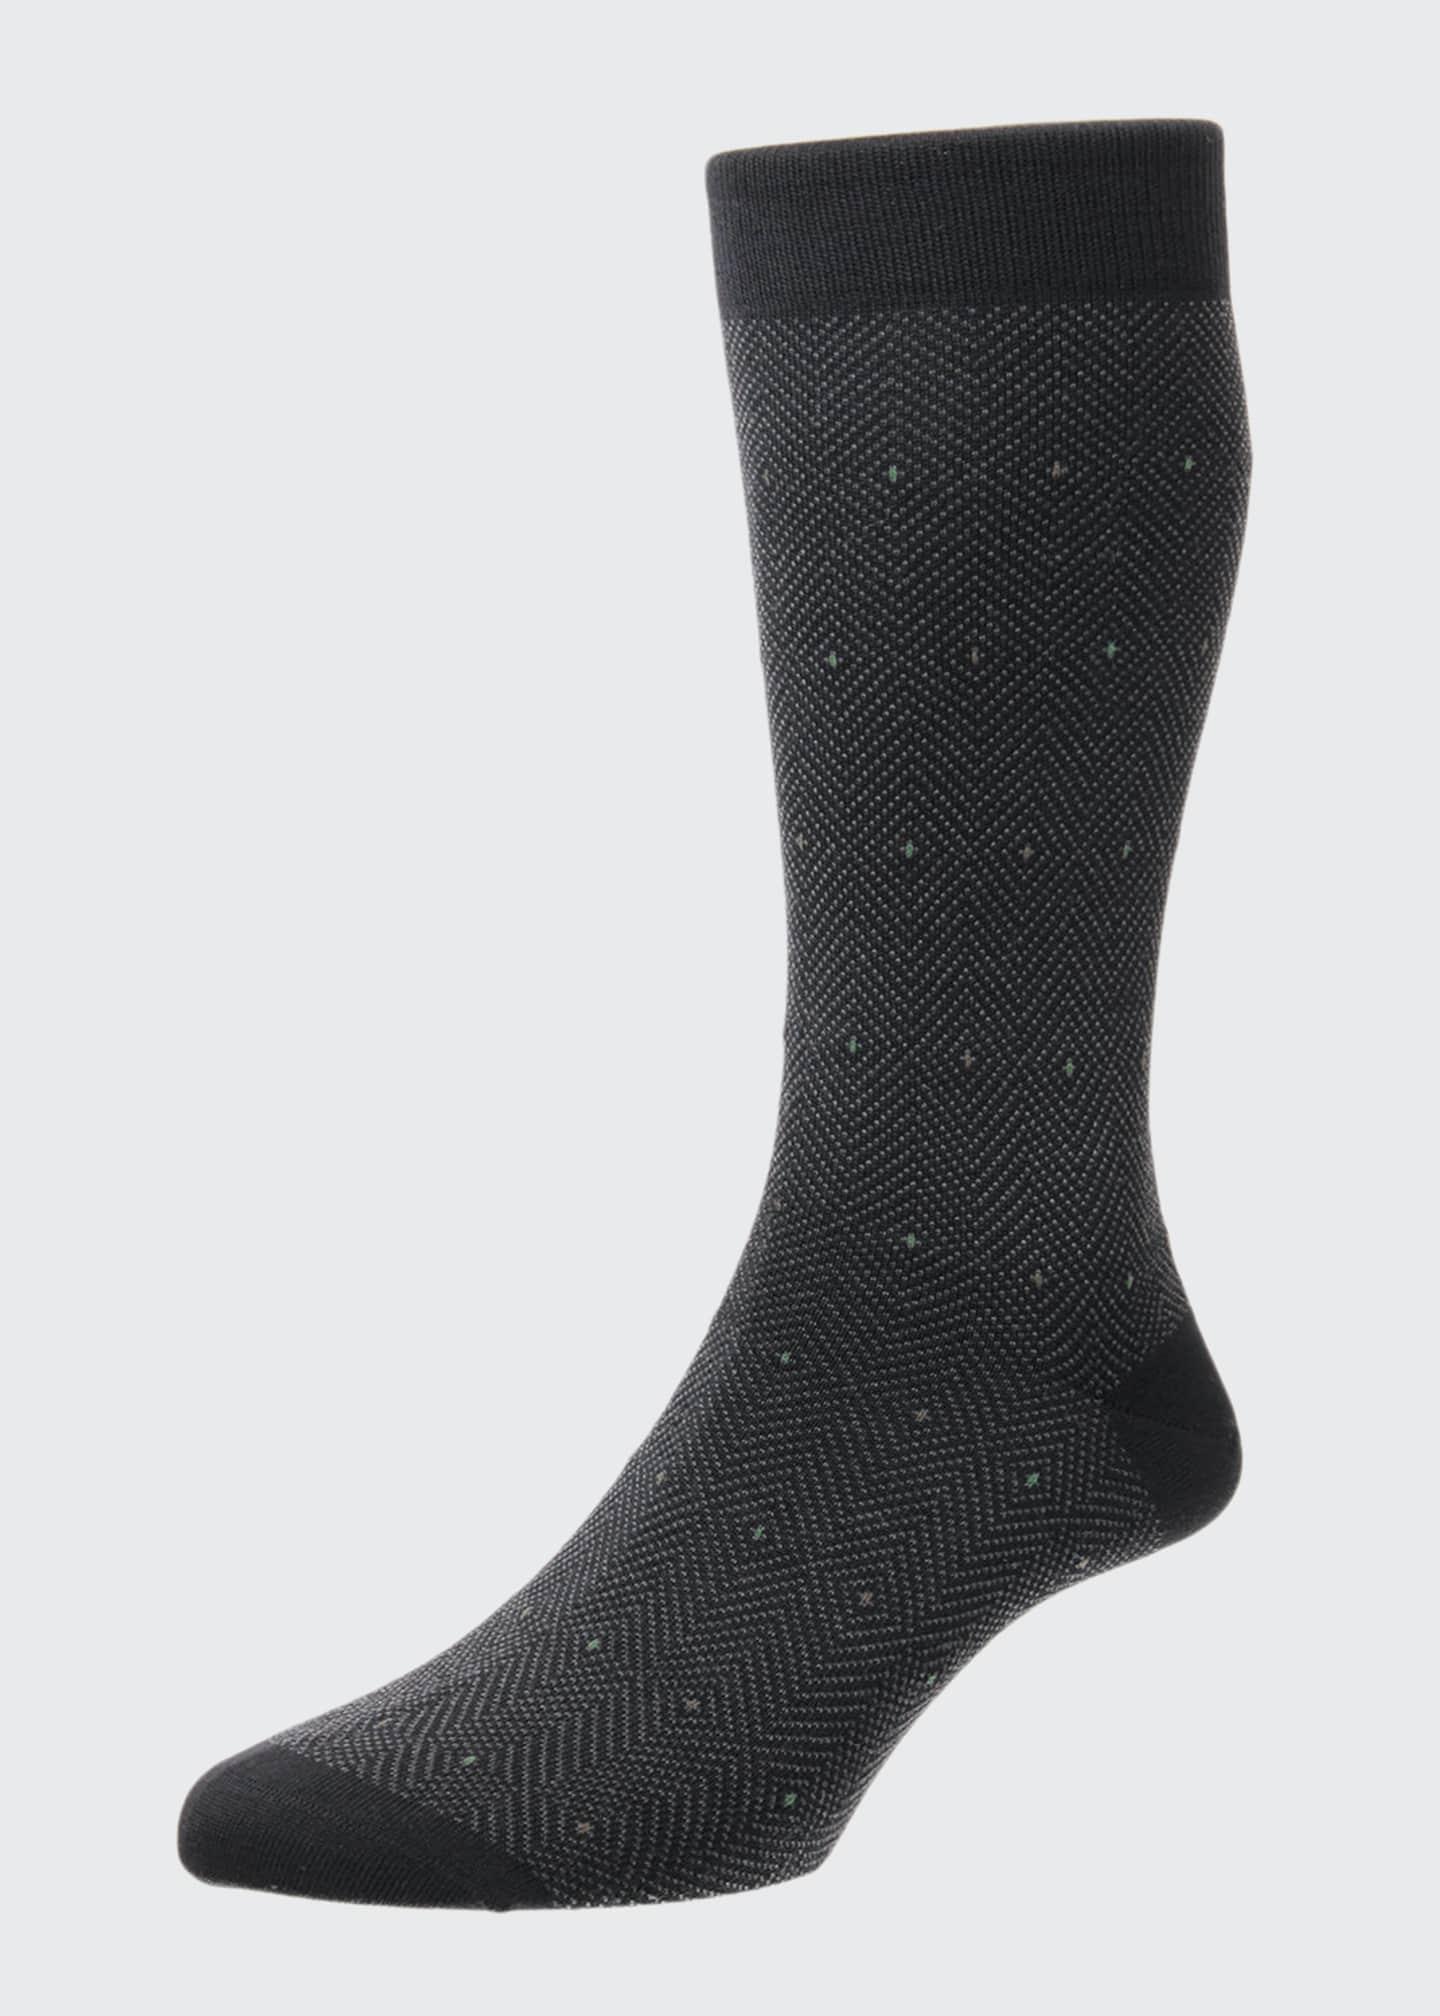 Pantherella Men's Hobart Merino Royale Herringbone Diamond Socks